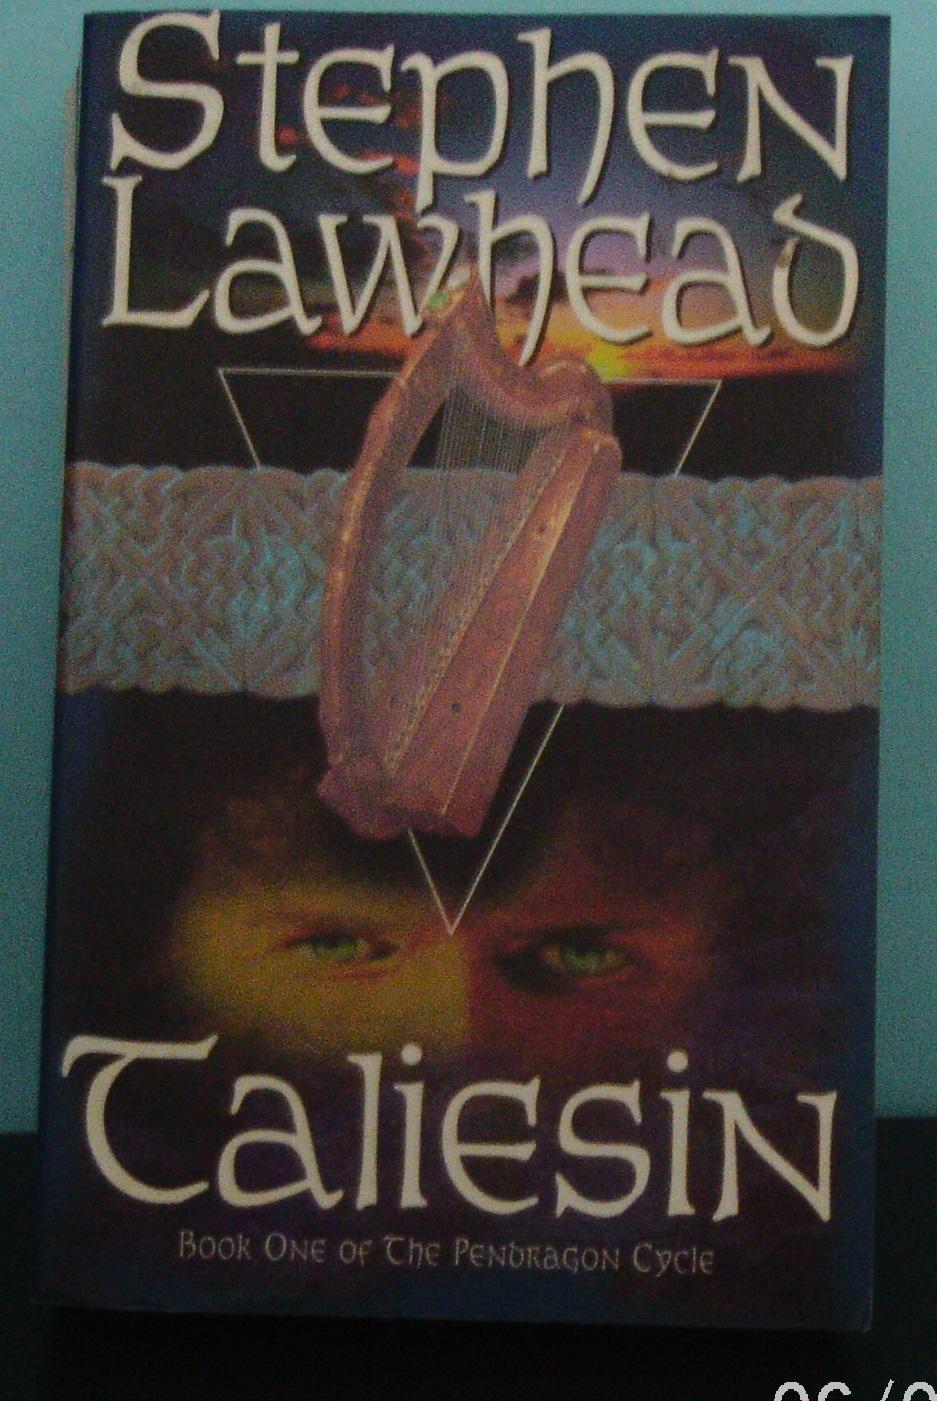 Taliesin Book One of the Pendragon Cycle